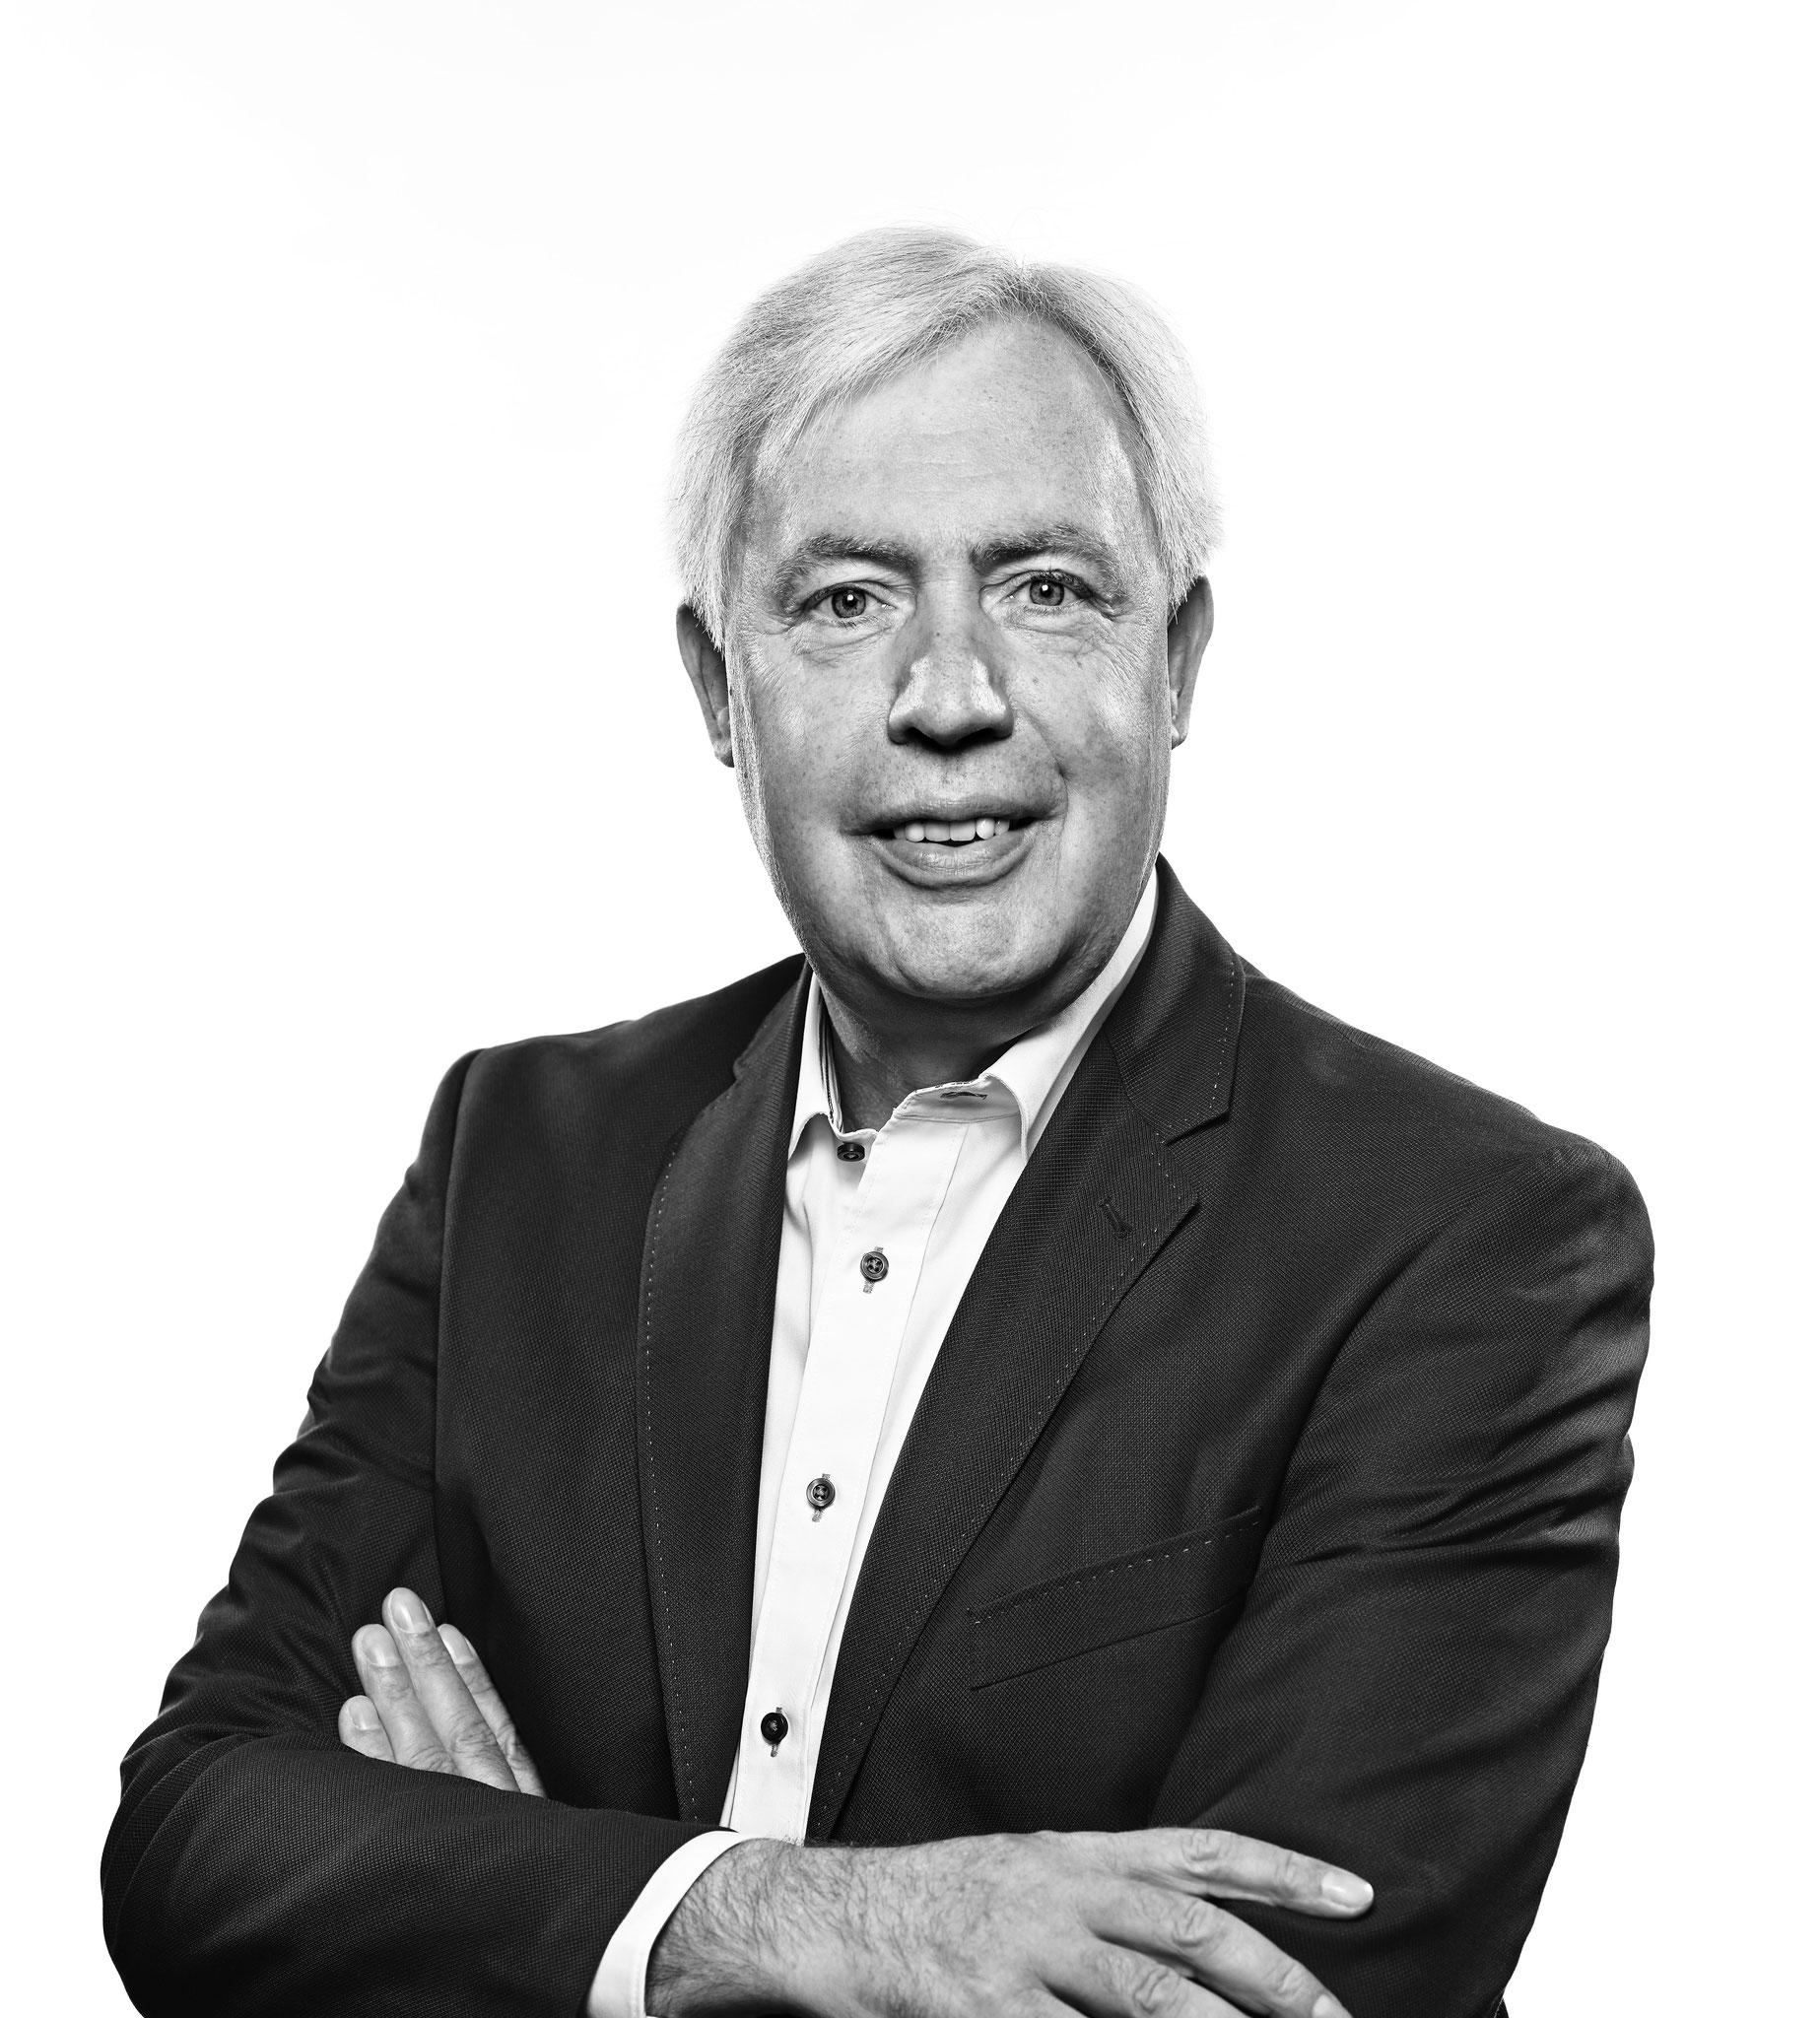 Listenplatz 6: Stefan Wimmers